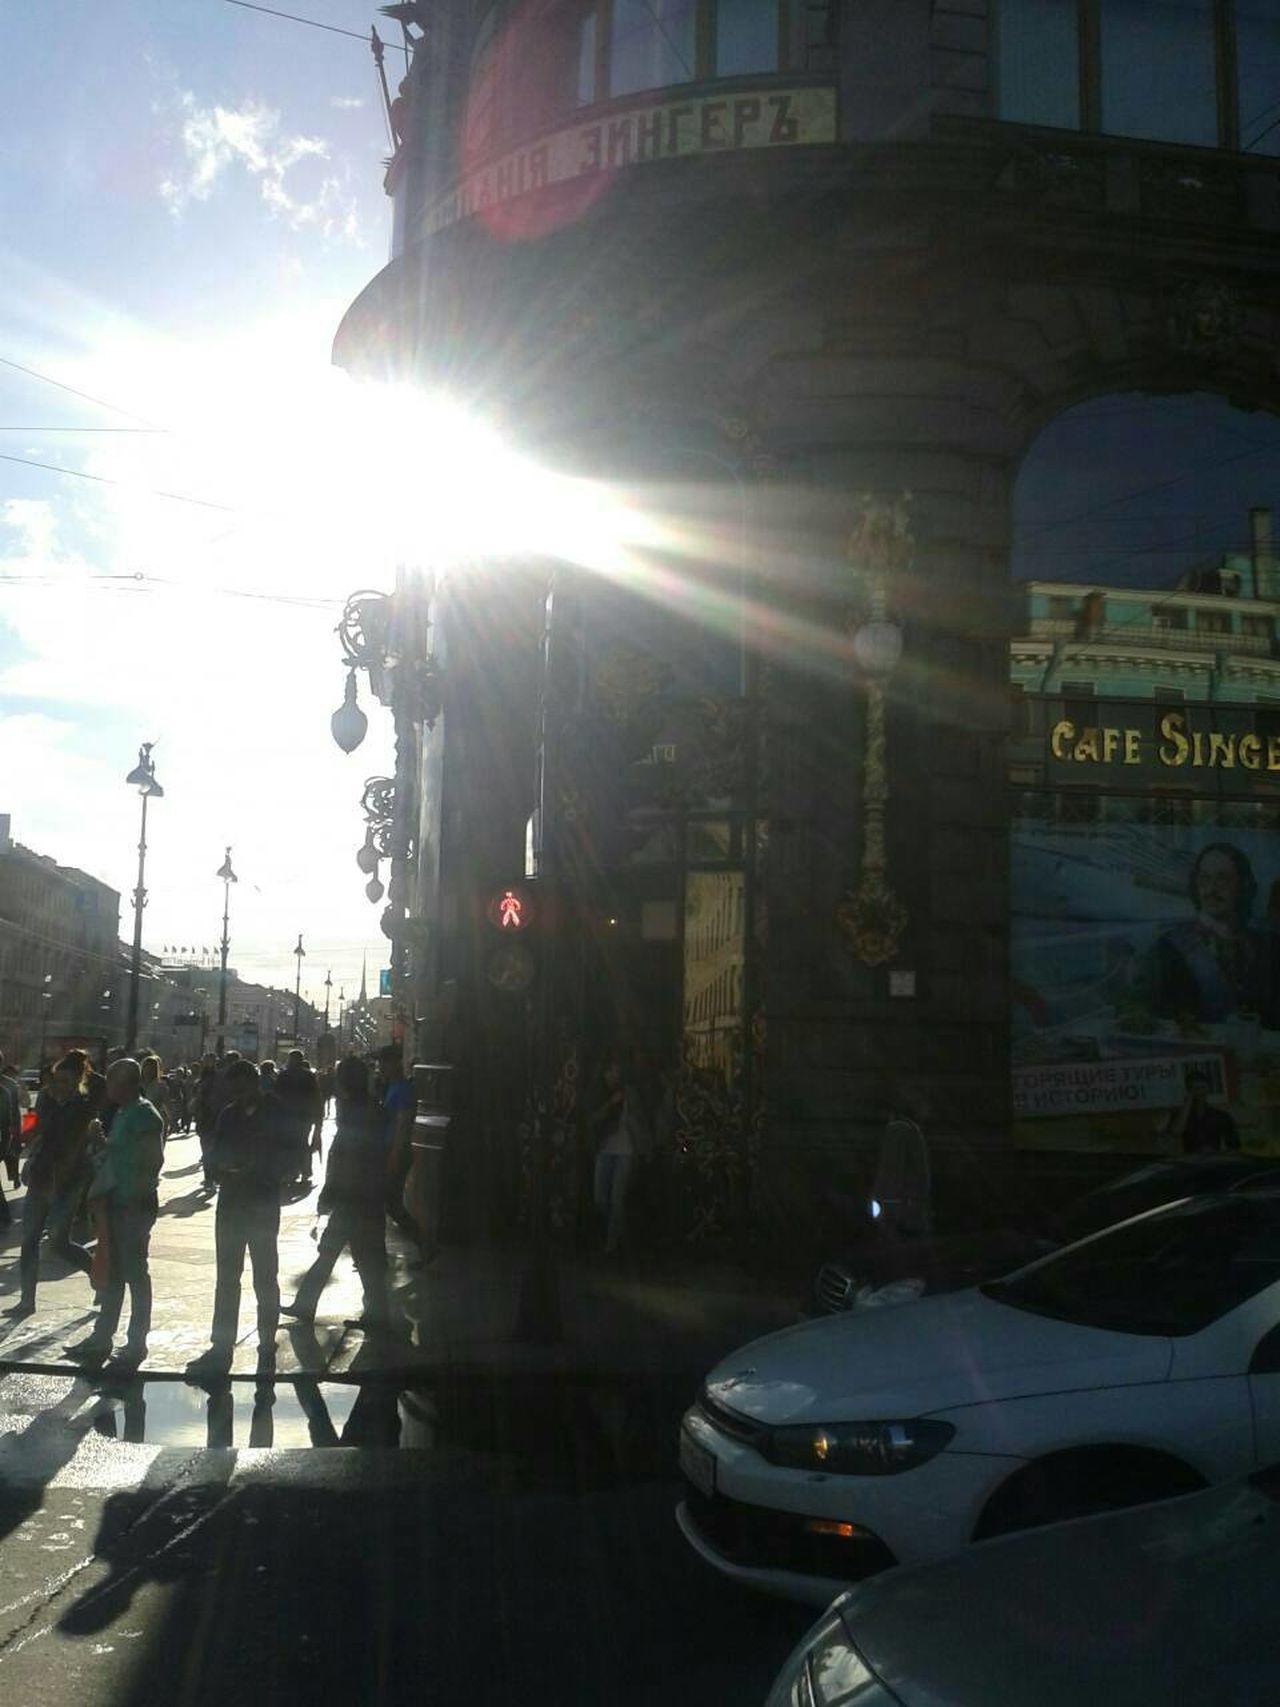 Streetphotography Summer Eyeemphotography EyeEm Best Shots Sunshine ☀ Piter  The Street Photographer - 2016 EyeEm Awards Peterburg The Photojournalist – 2016 EyeEm Awards The Photojournalist - 2016 EyeEm Awards Piter ❤️